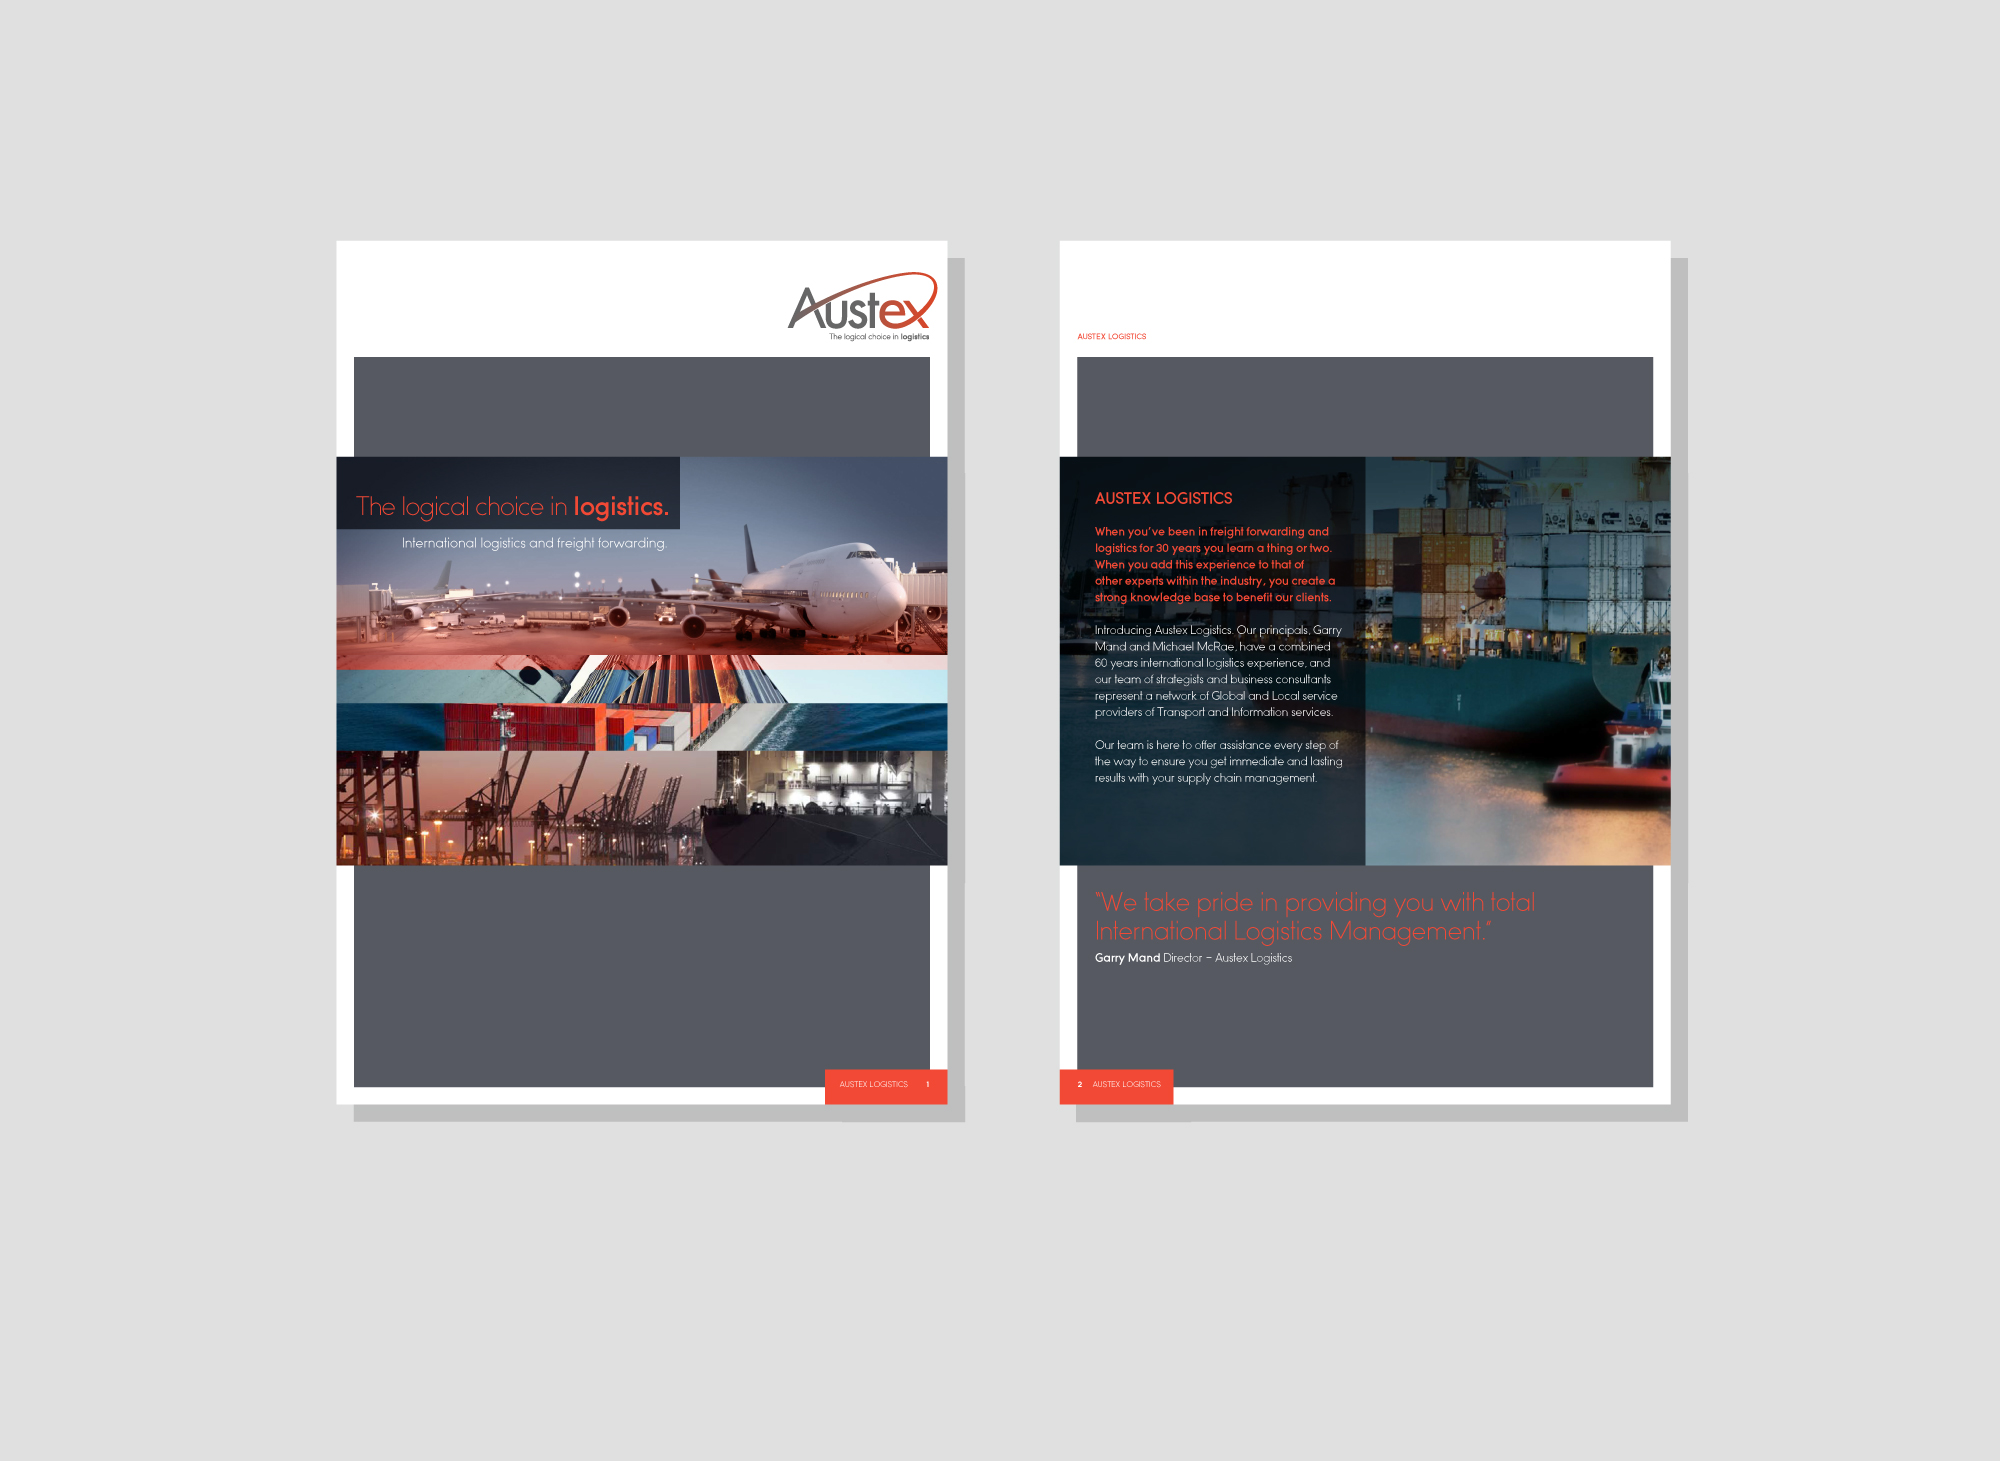 Austex Logistics Case Study 2